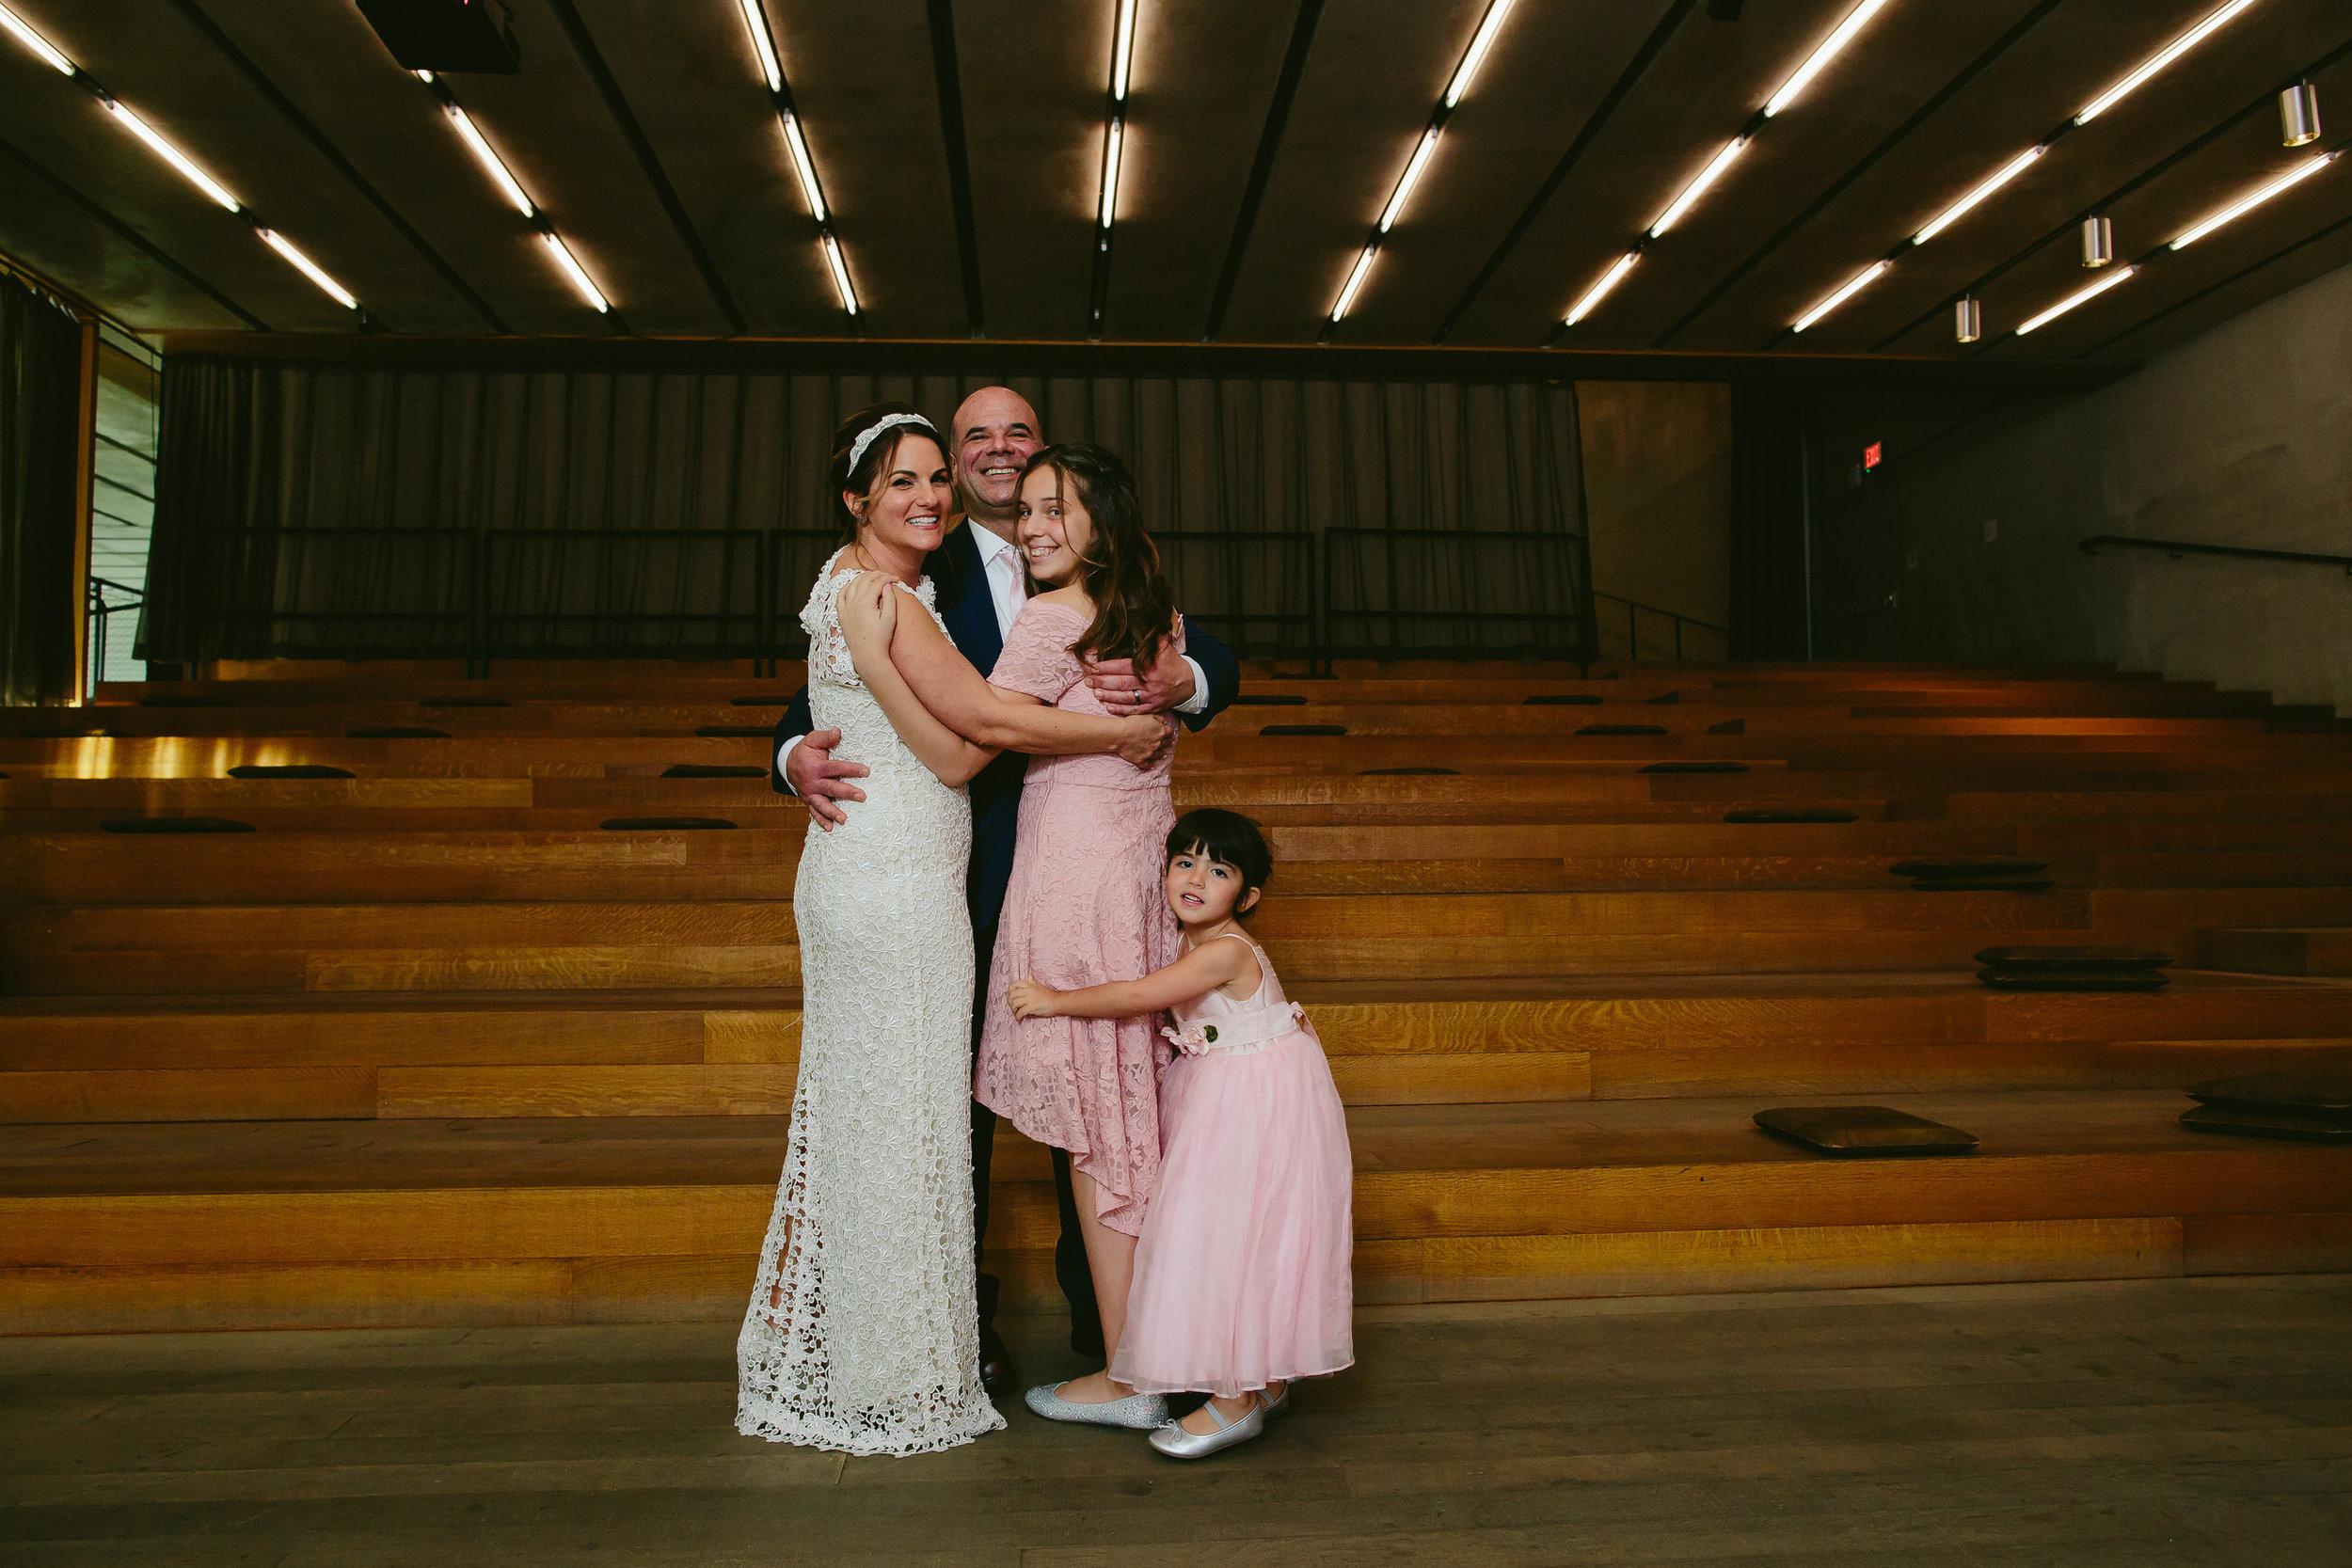 PAMM-wedding-group-portrait-steph-lynn-photo-21.jpg